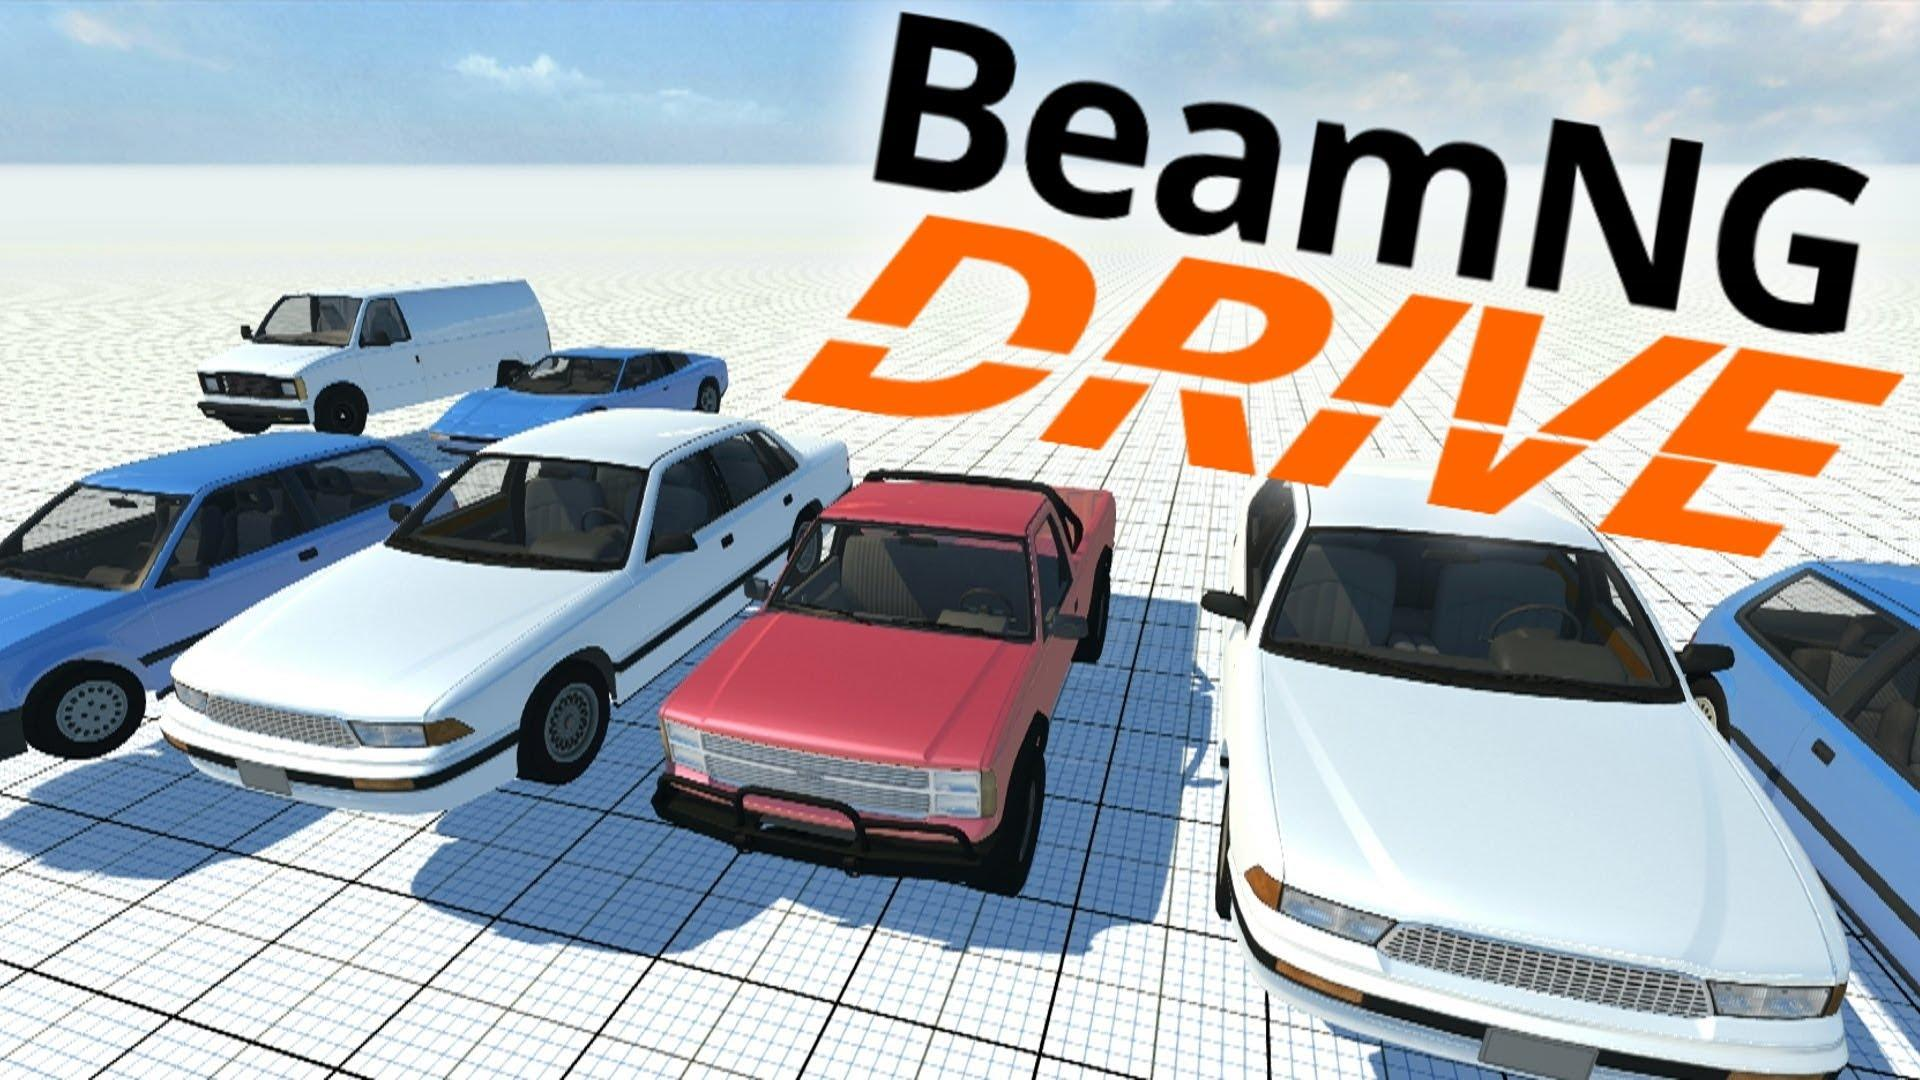 BeamNG.drive APK Full Version Free Download (July 2021)